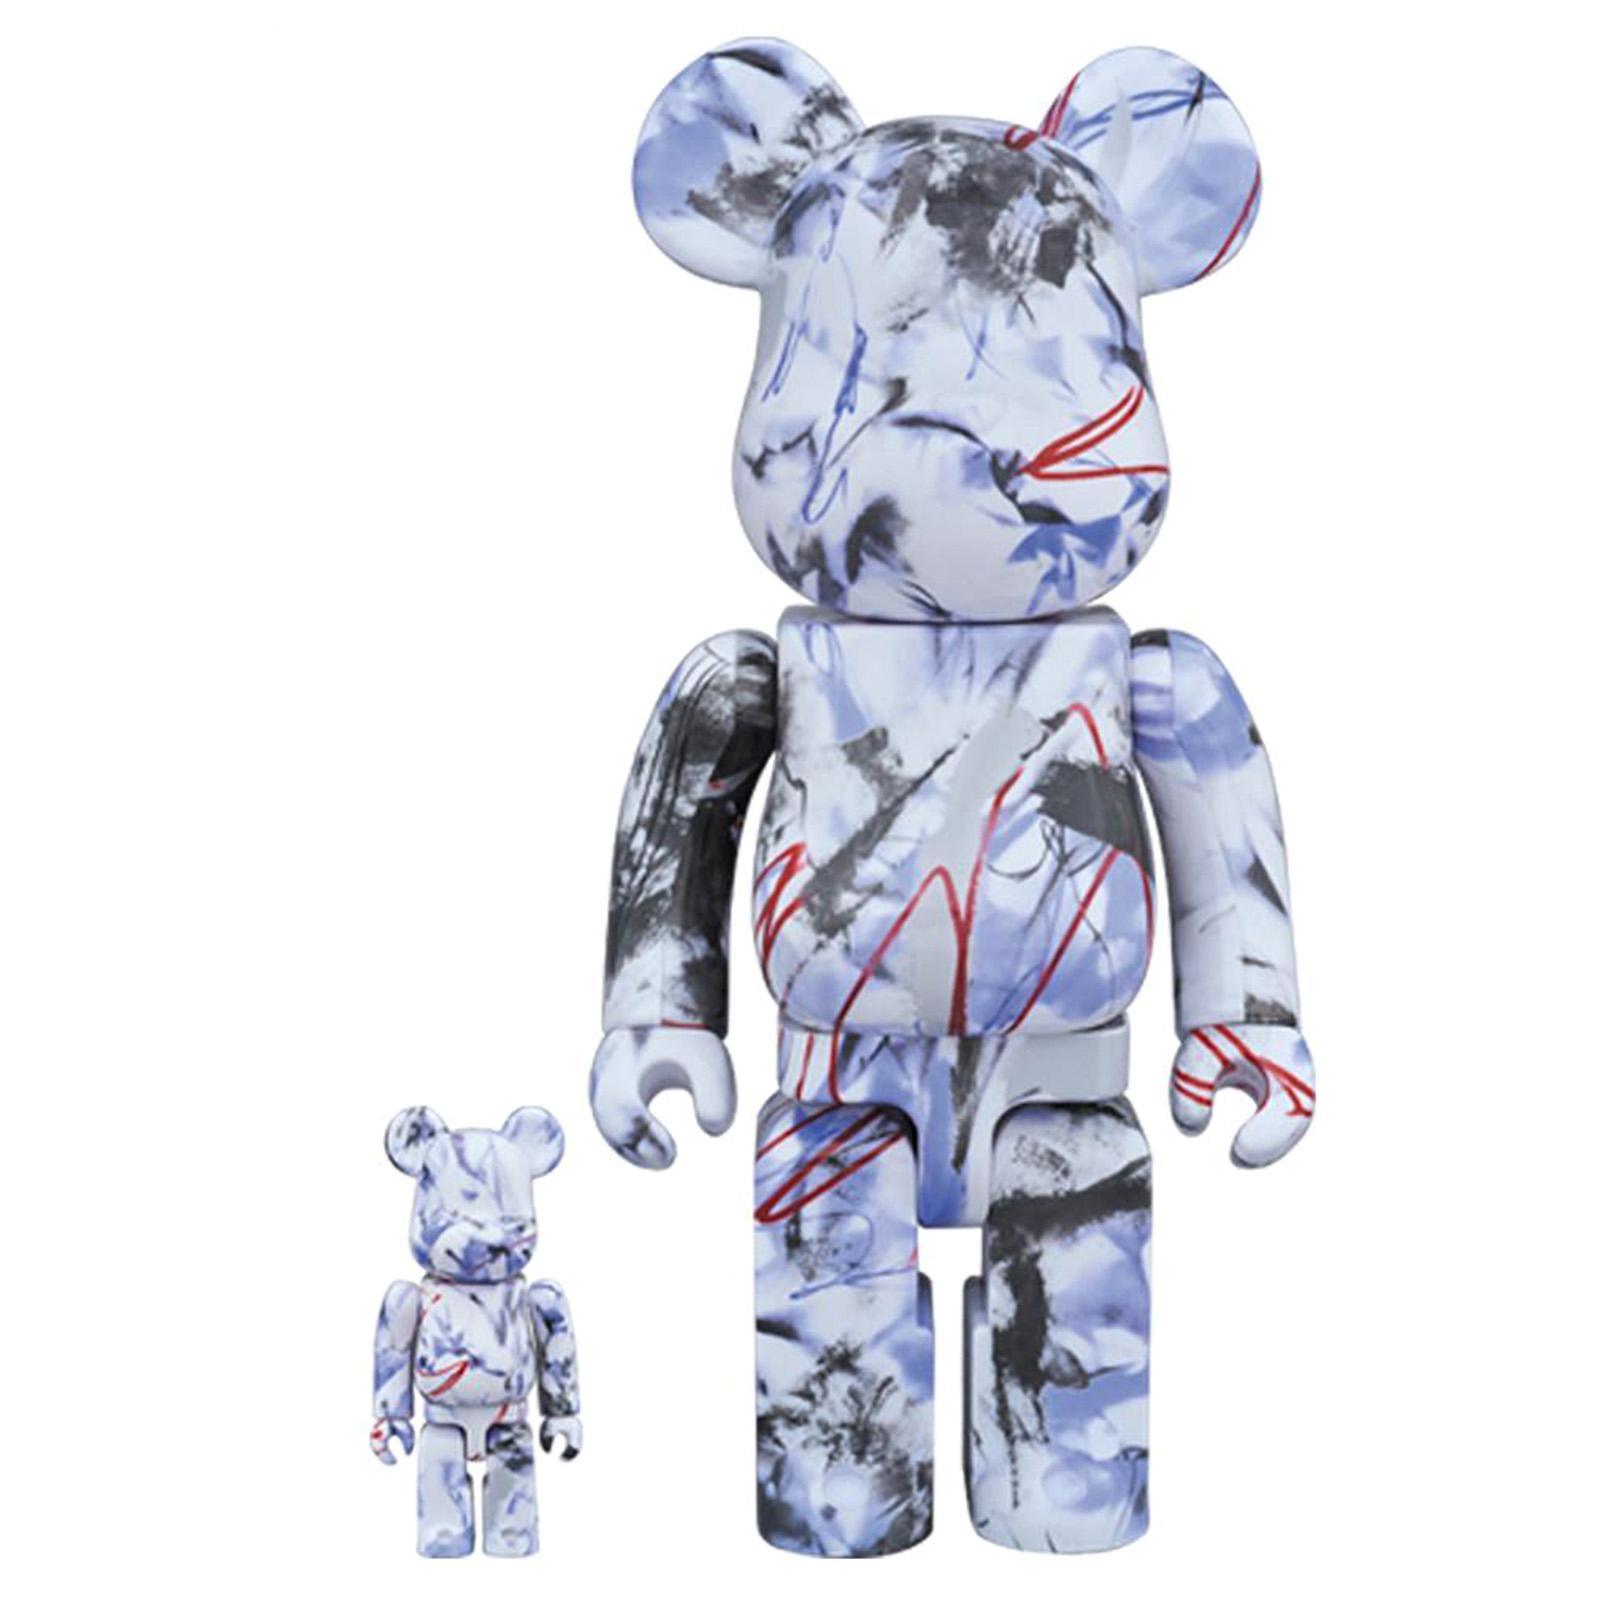 Medicom Toy Bearbrick Futura - MultiColor - Pupazzo Gadget Toy 100% & 400%